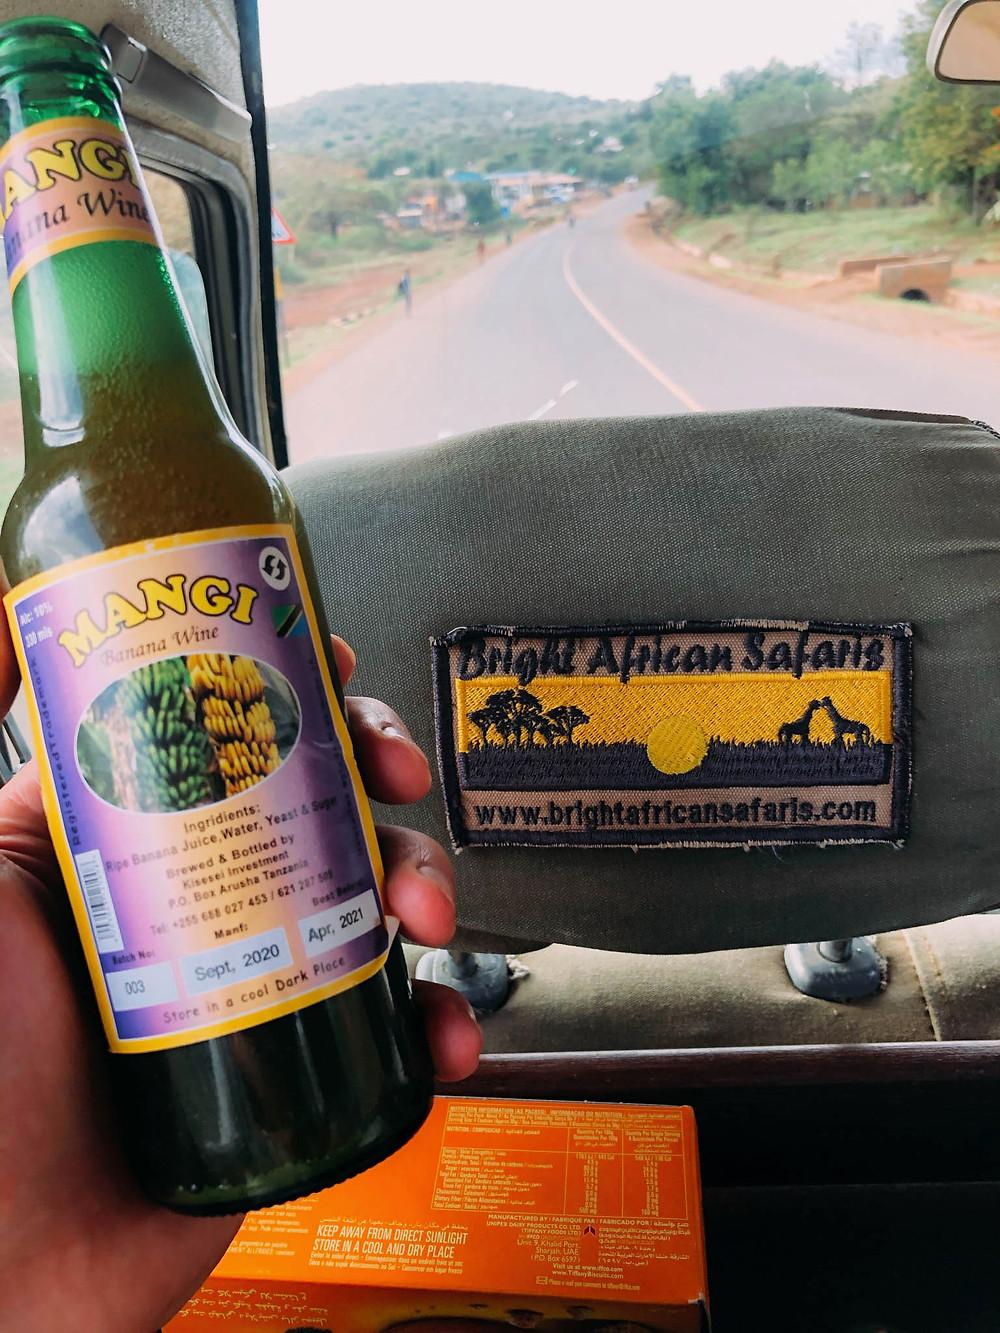 Enjoying some delicious banana wine on the way to Ngorongoro